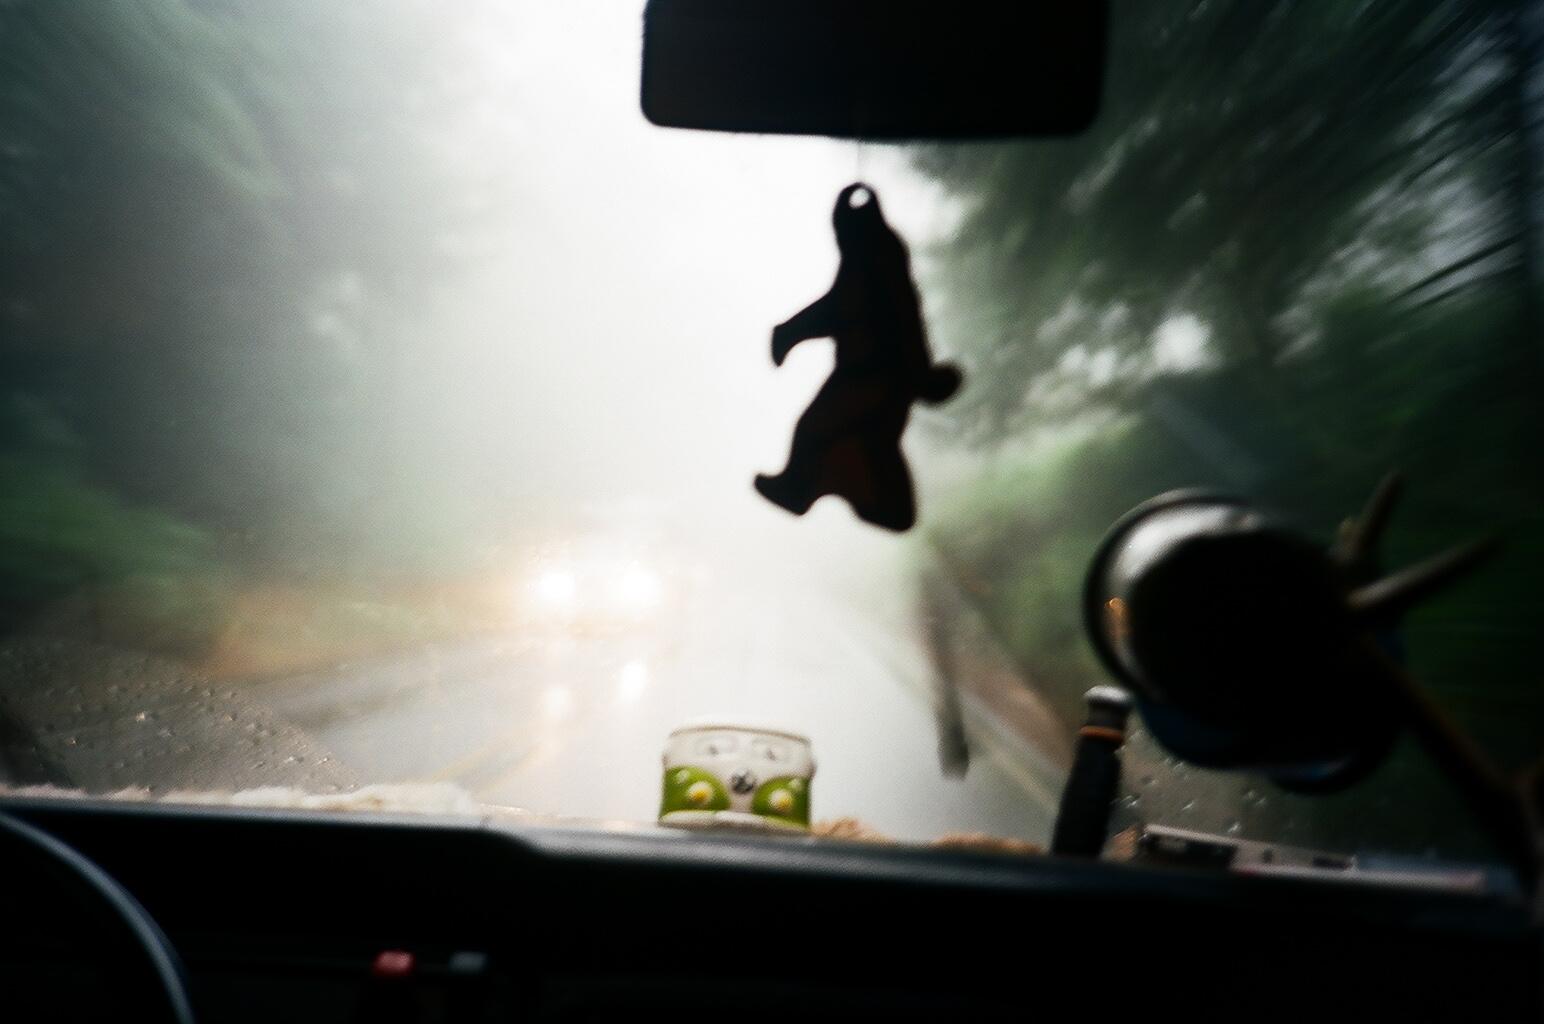 Big Foot spotting. Driving thru rain on the Oregon coast.